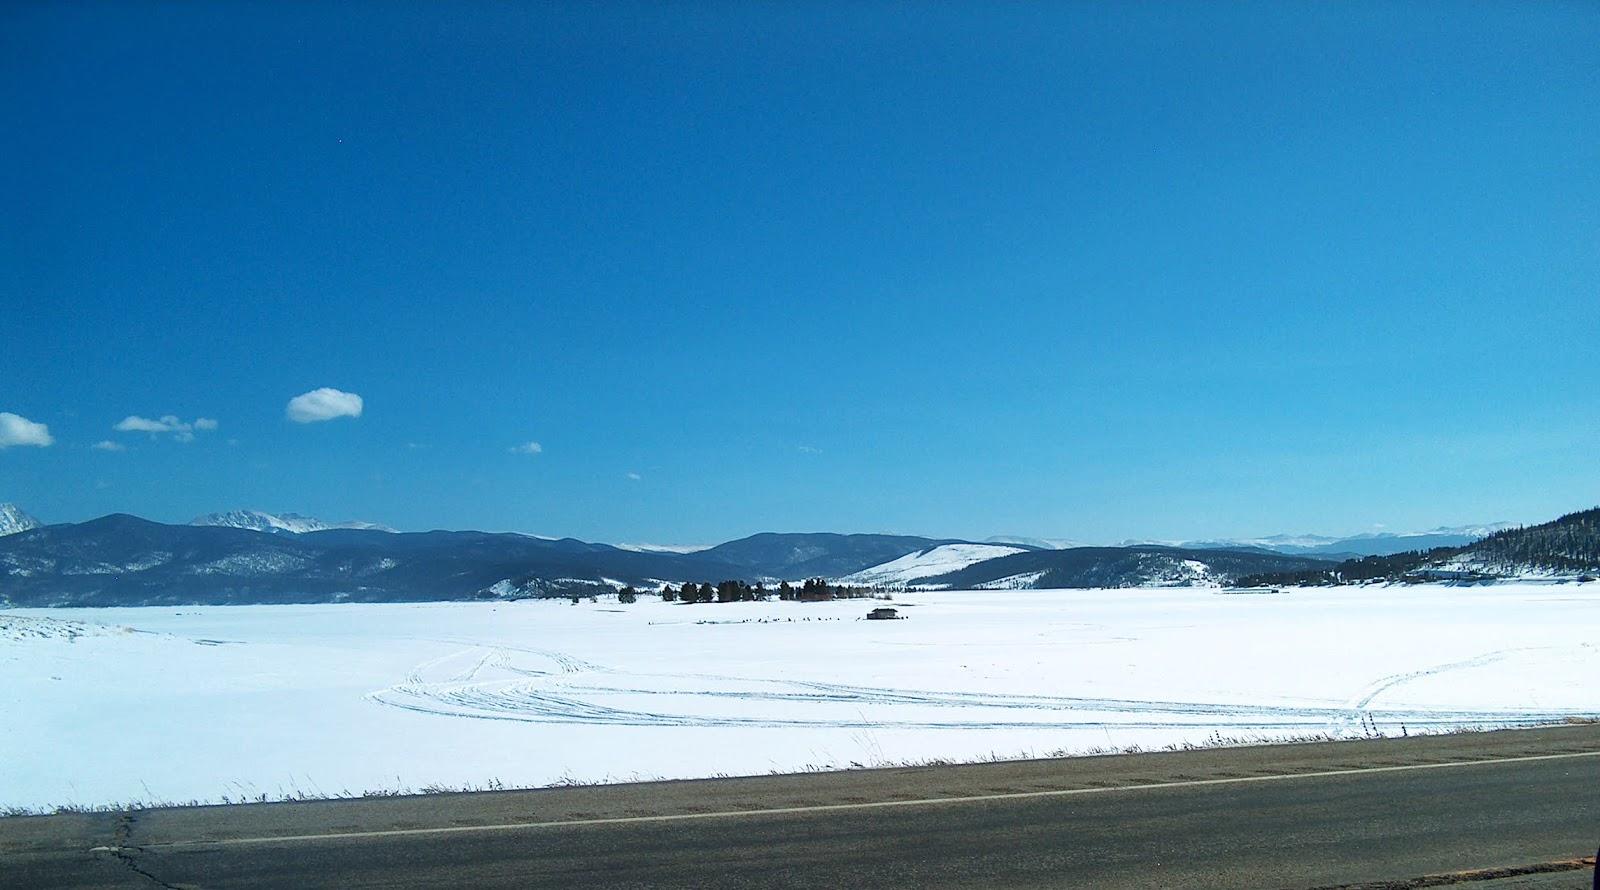 Pilgrims 39 journey winter park granby colorado for Lake granby fishing report